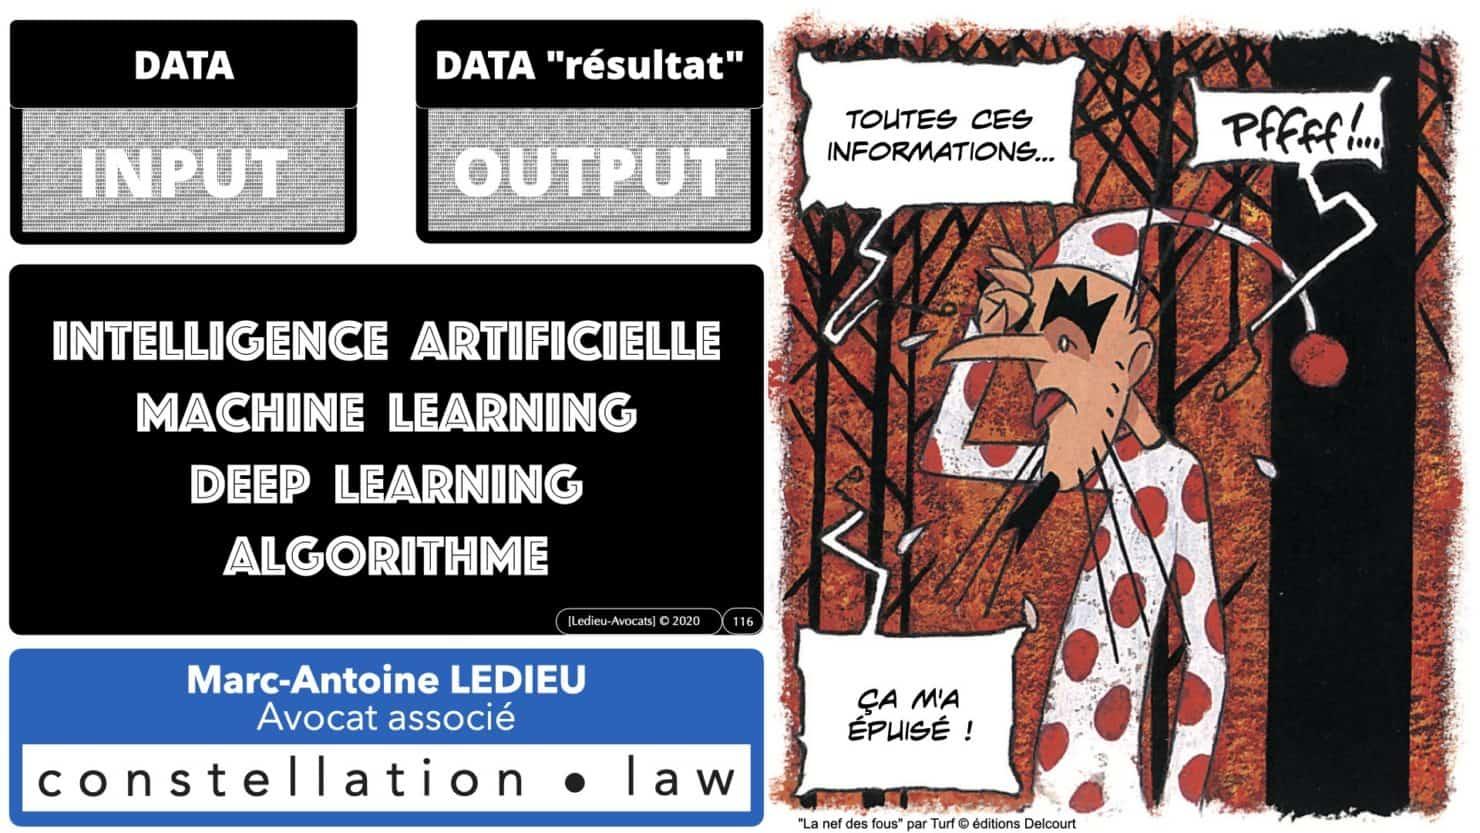 307 Intelligence artificielle-machine-learning-deep-learning-base de données-BIG-DATA *16:9* Constellation ©Ledieu-Avocat-13-10-2020.116